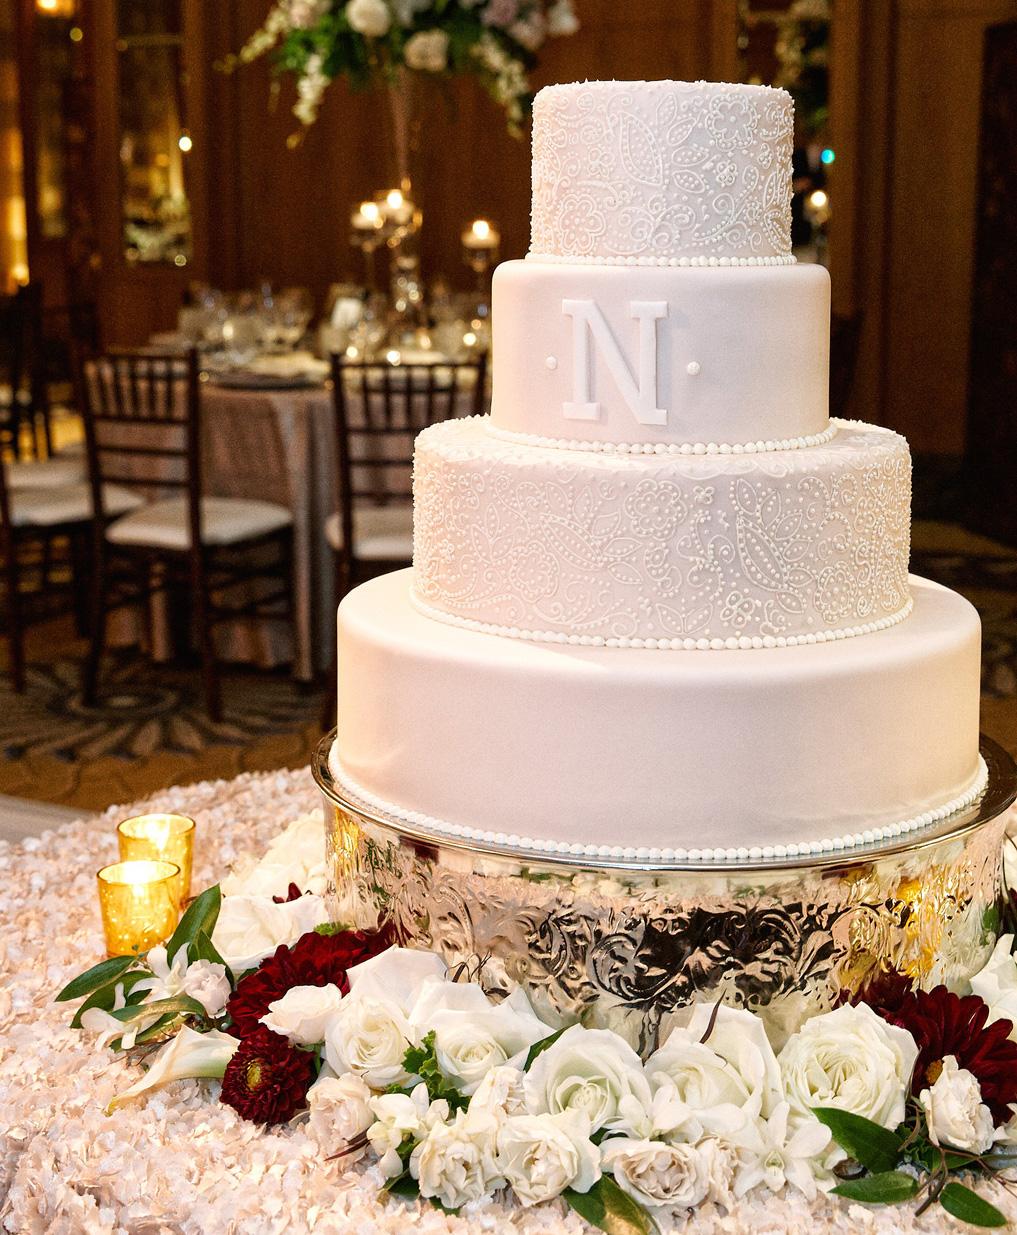 White wedding cake for Chicago wedding